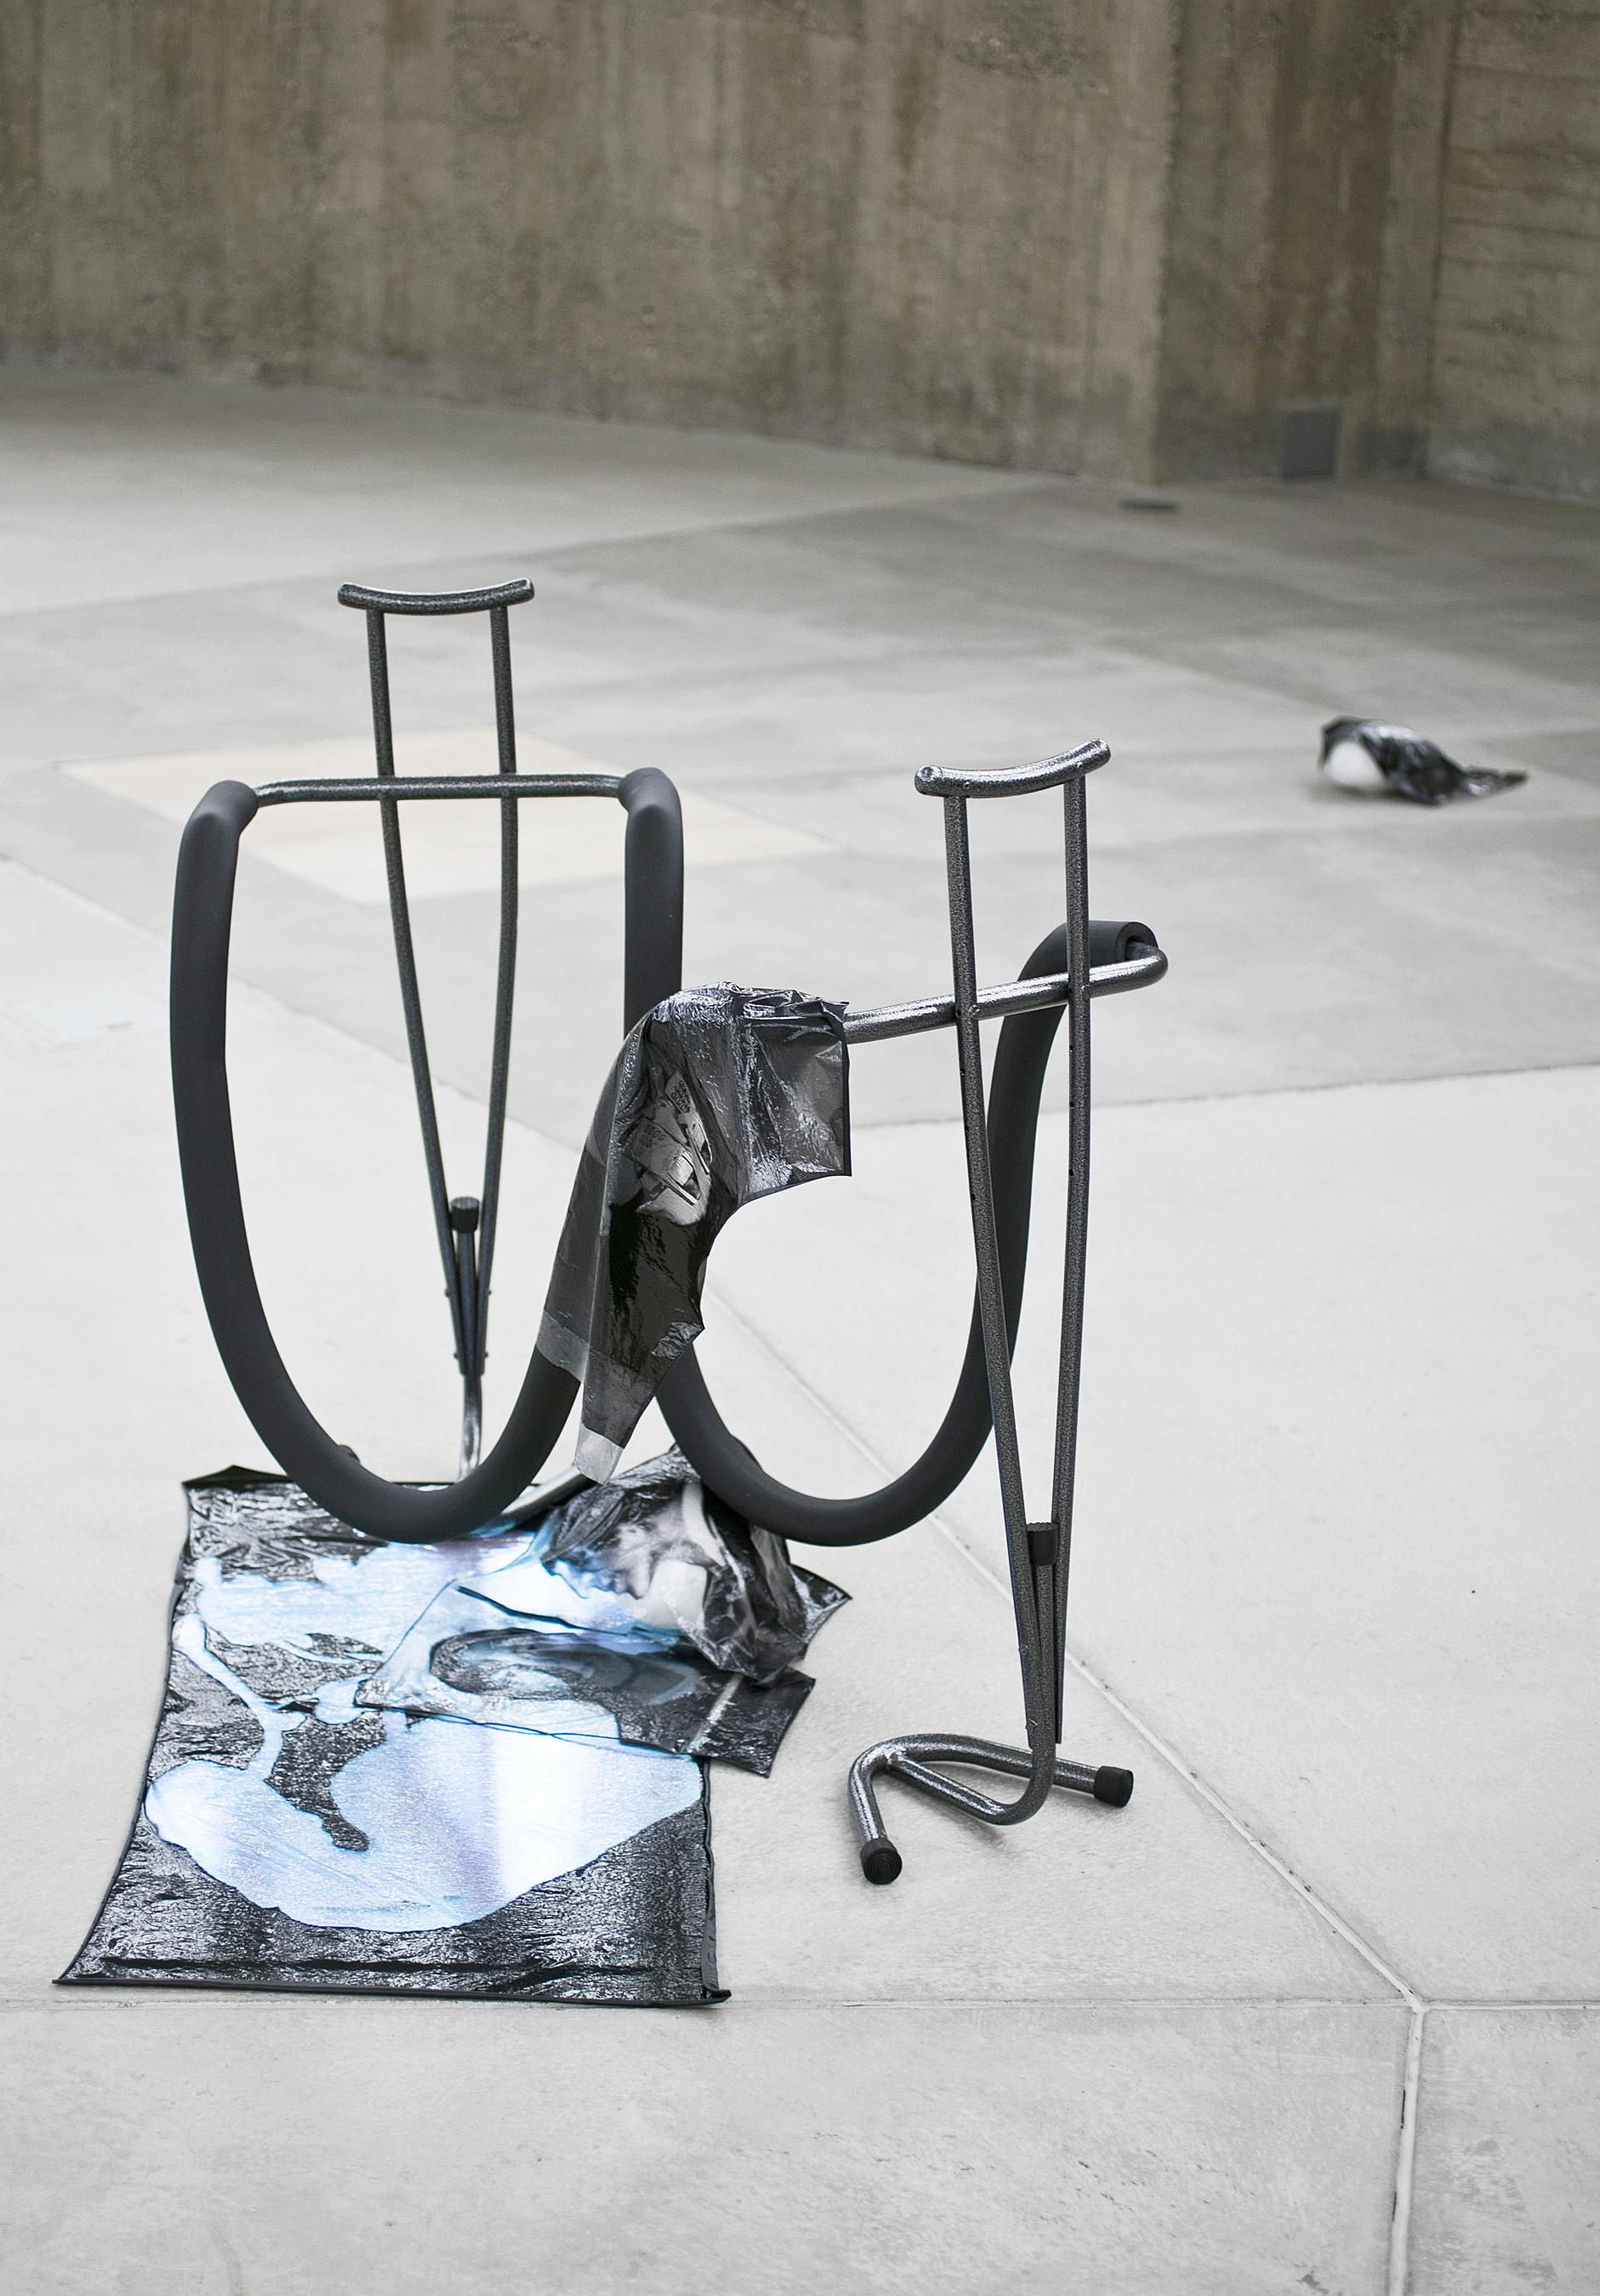 MIND(fool)NESS, 2017, Sculpture,103 x 117 x 63 cm,Inkjet prints on plastic, radiant plexi-sheet, crutches, rubber, metal, polystyrene, paint, bandage